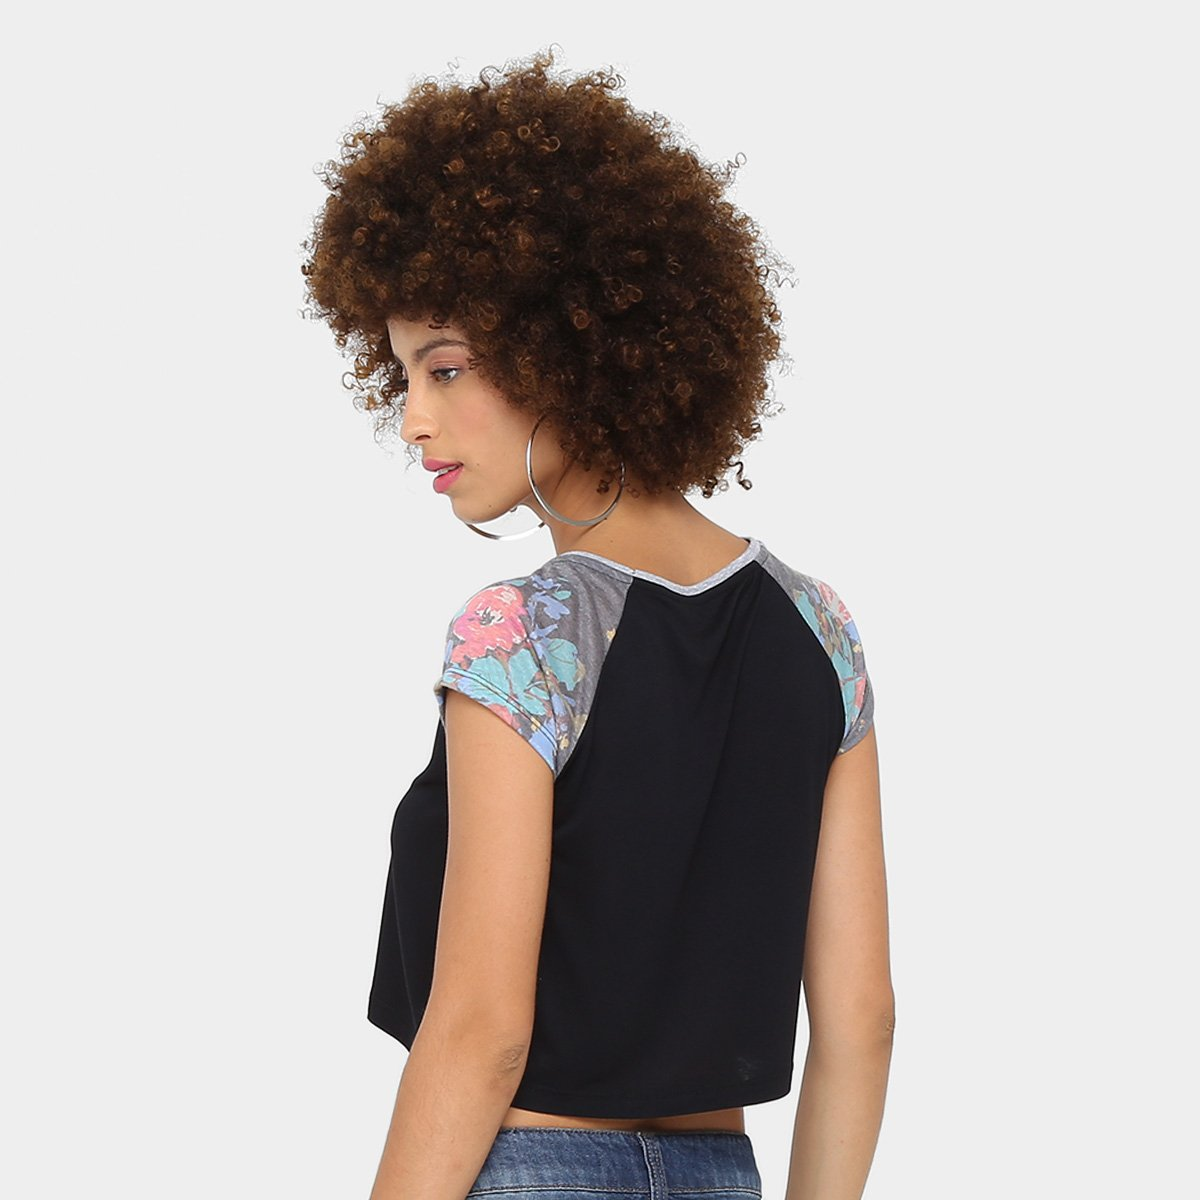 Feminina Buds Camiseta Camiseta Camiseta Buds Preto Volcom Forever Forever Feminina Volcom Volcom Buds Preto Twgqn